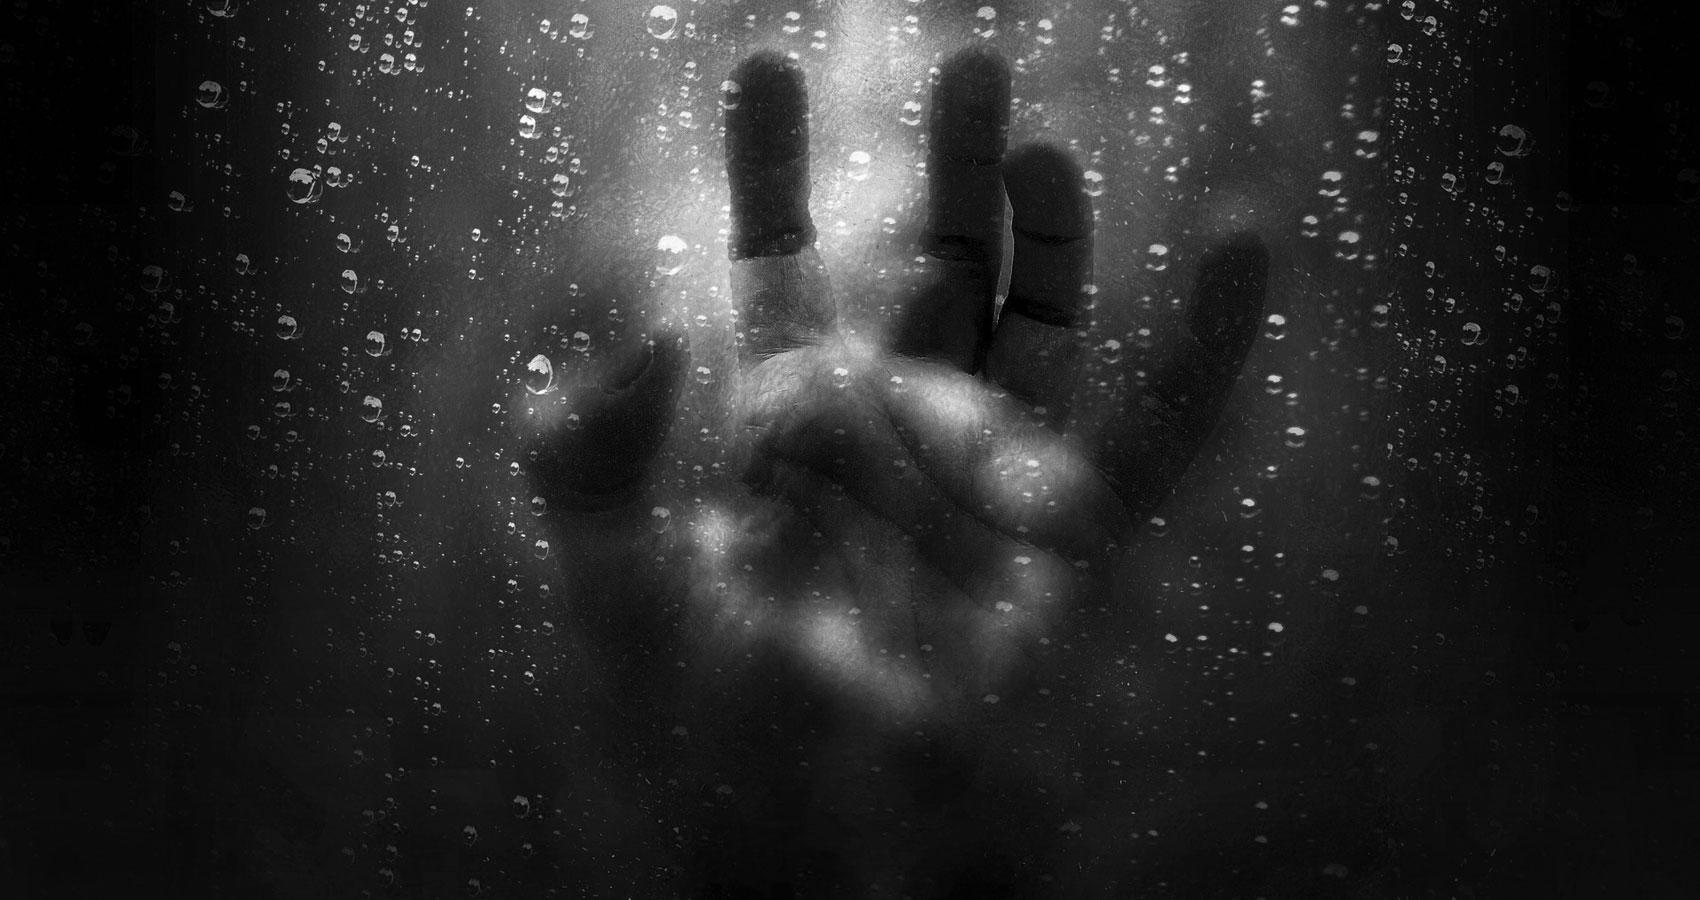 Fear has no Face..!! by Monika Ajay Kaul at Spillwords.com